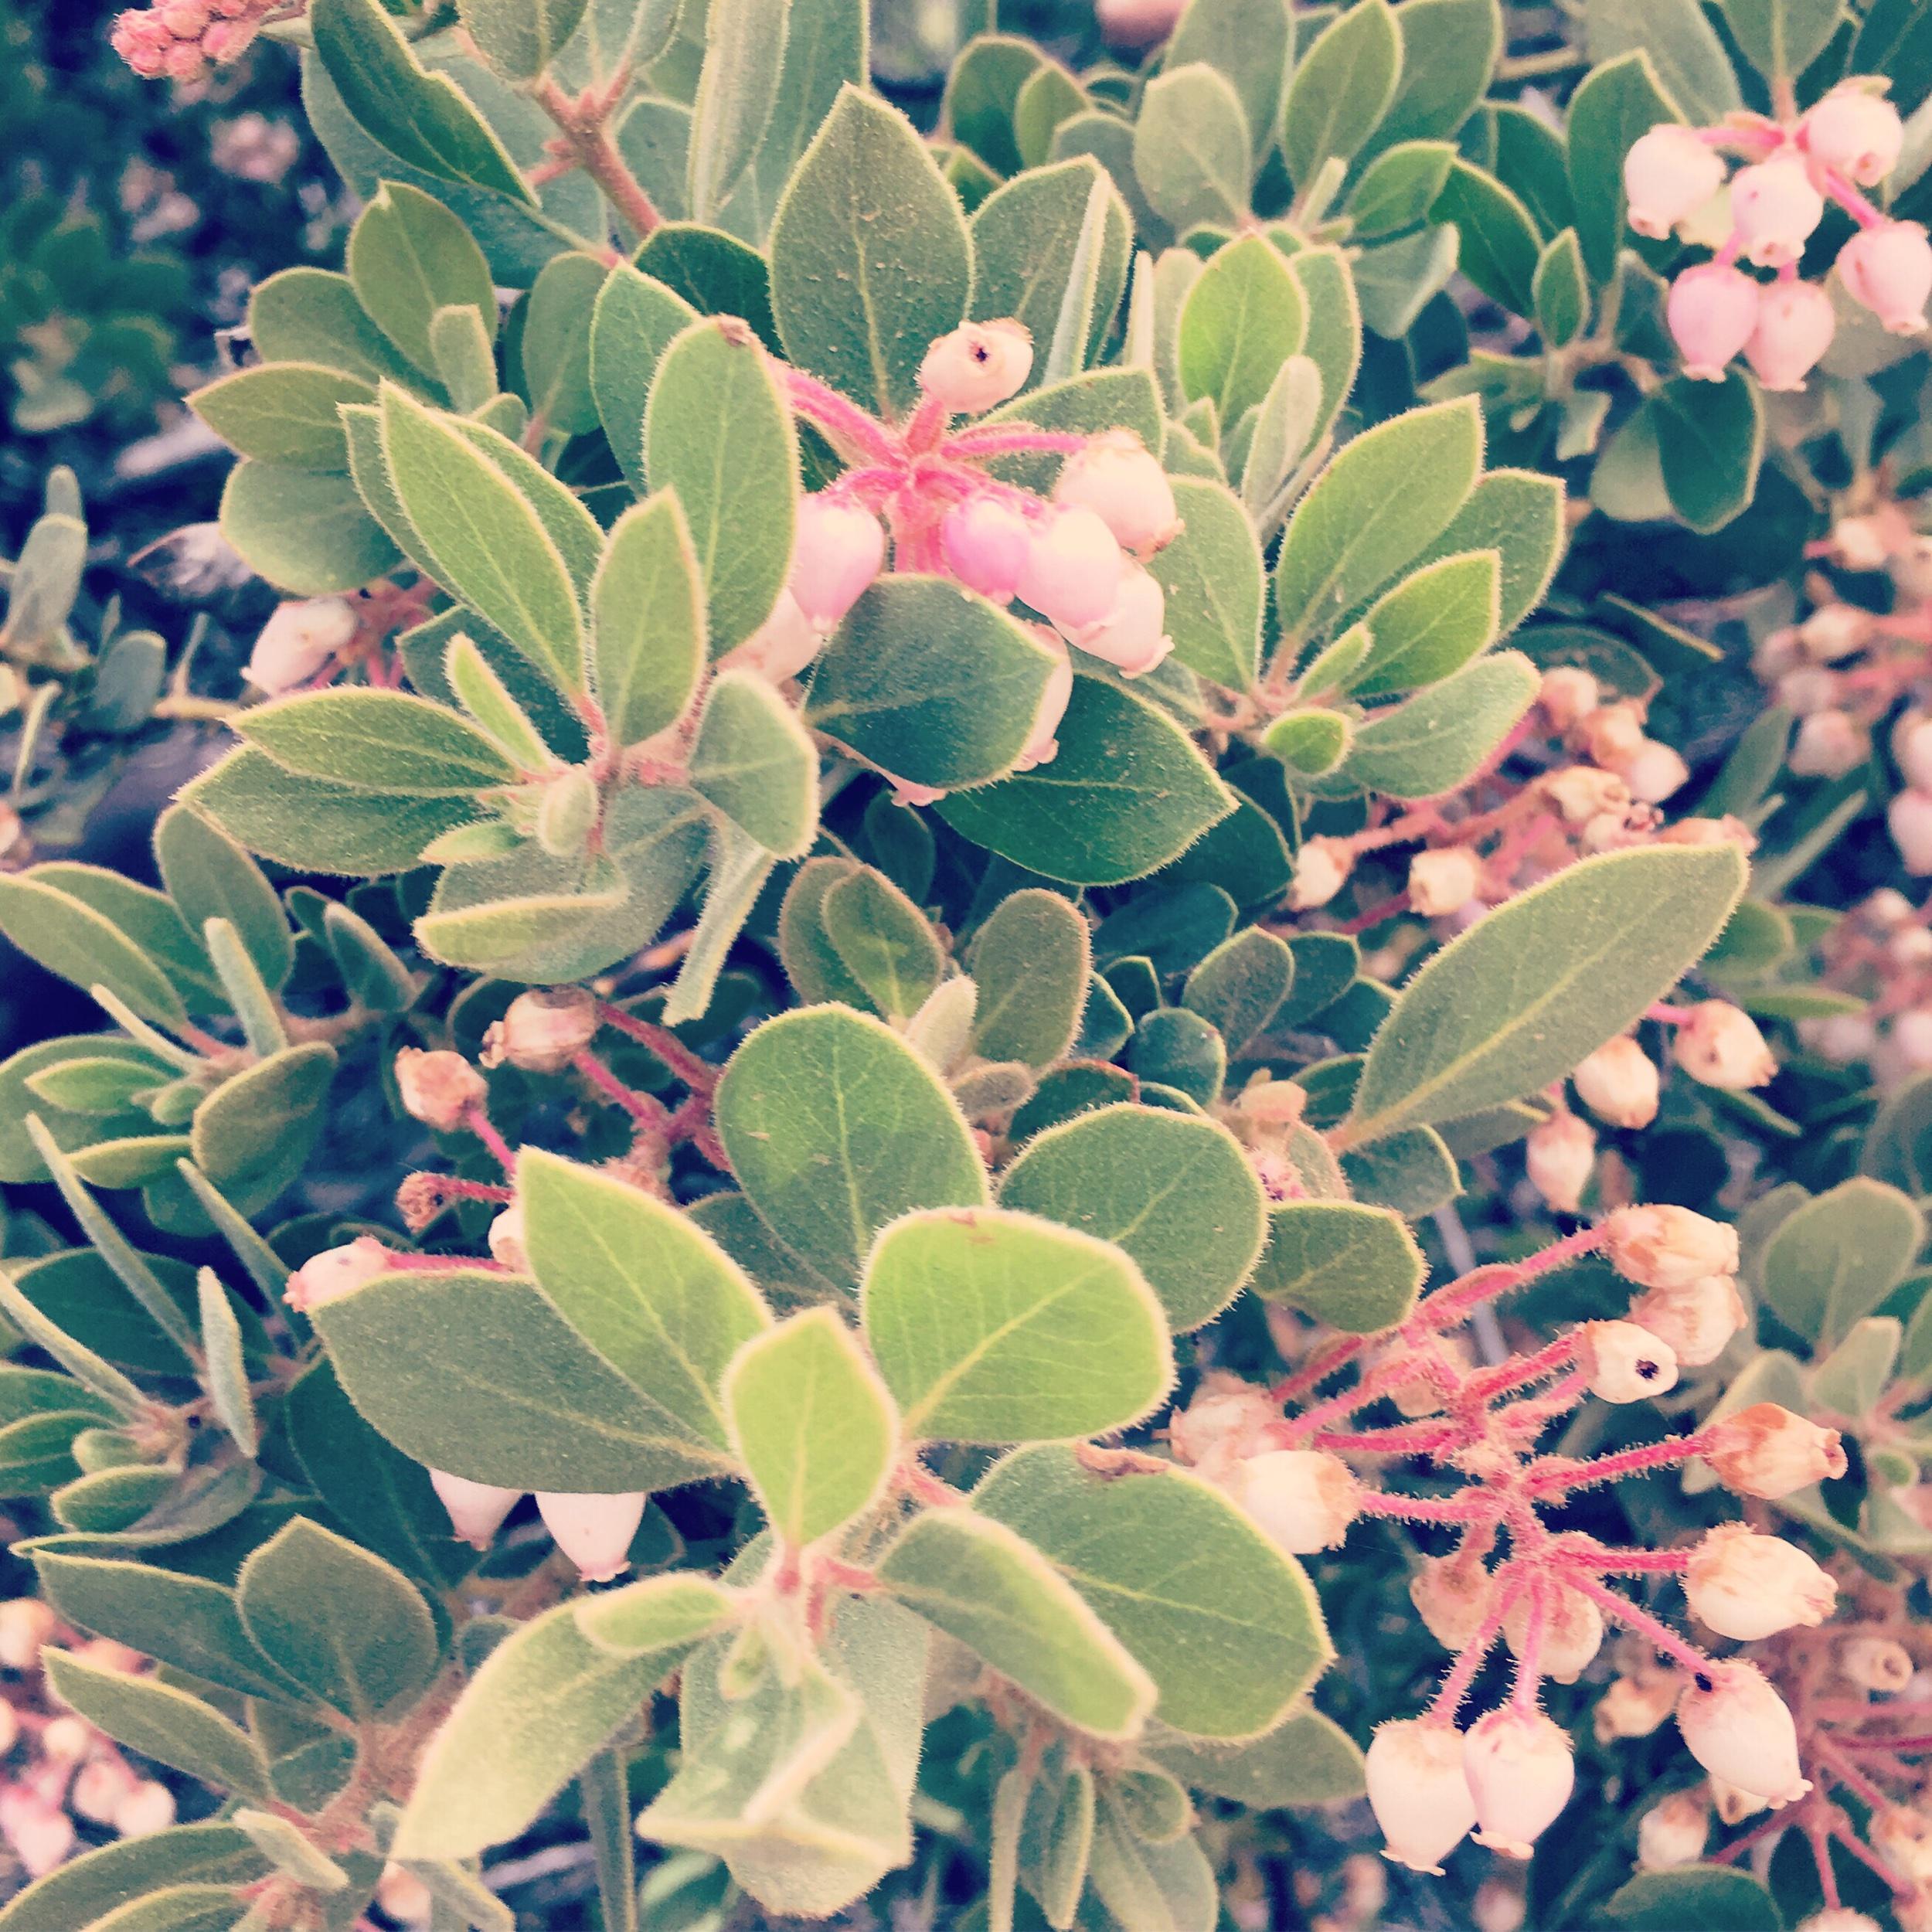 Manzanita Flowers -